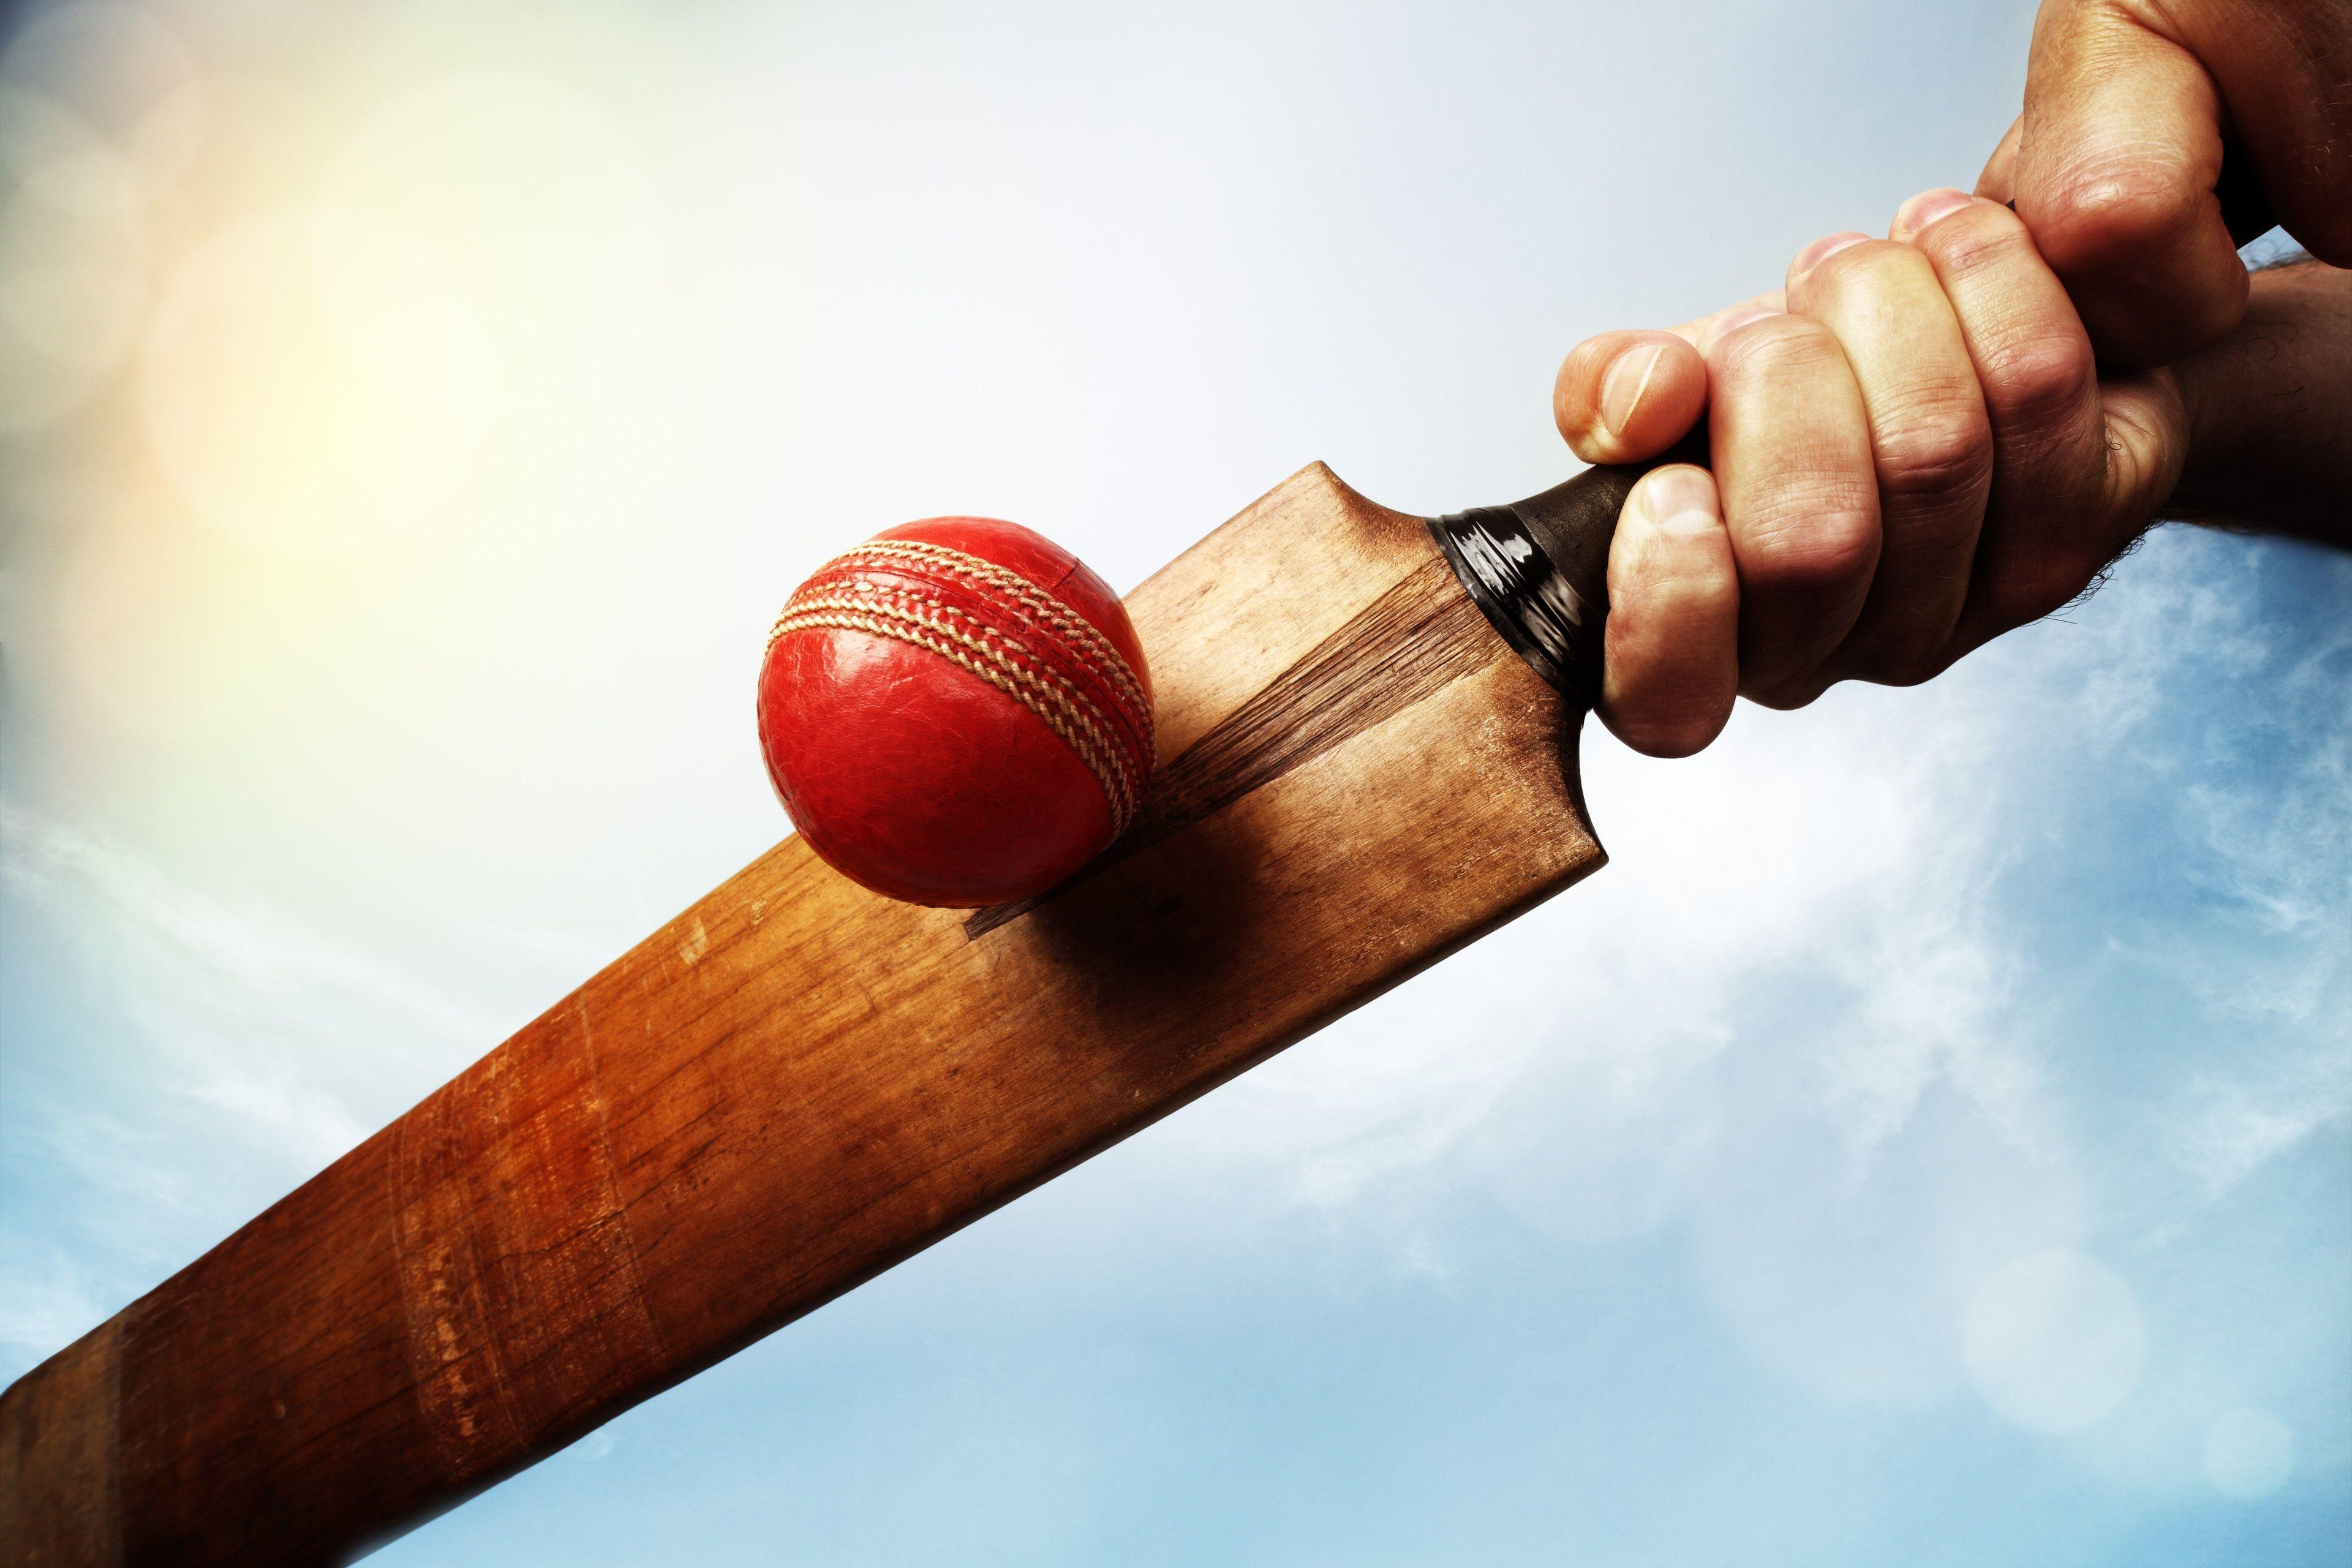 3840x2560 Cricket Ball 4k Amazing Wallpaper Hd For Desktop Cricket Match Cricket Tips Cricket